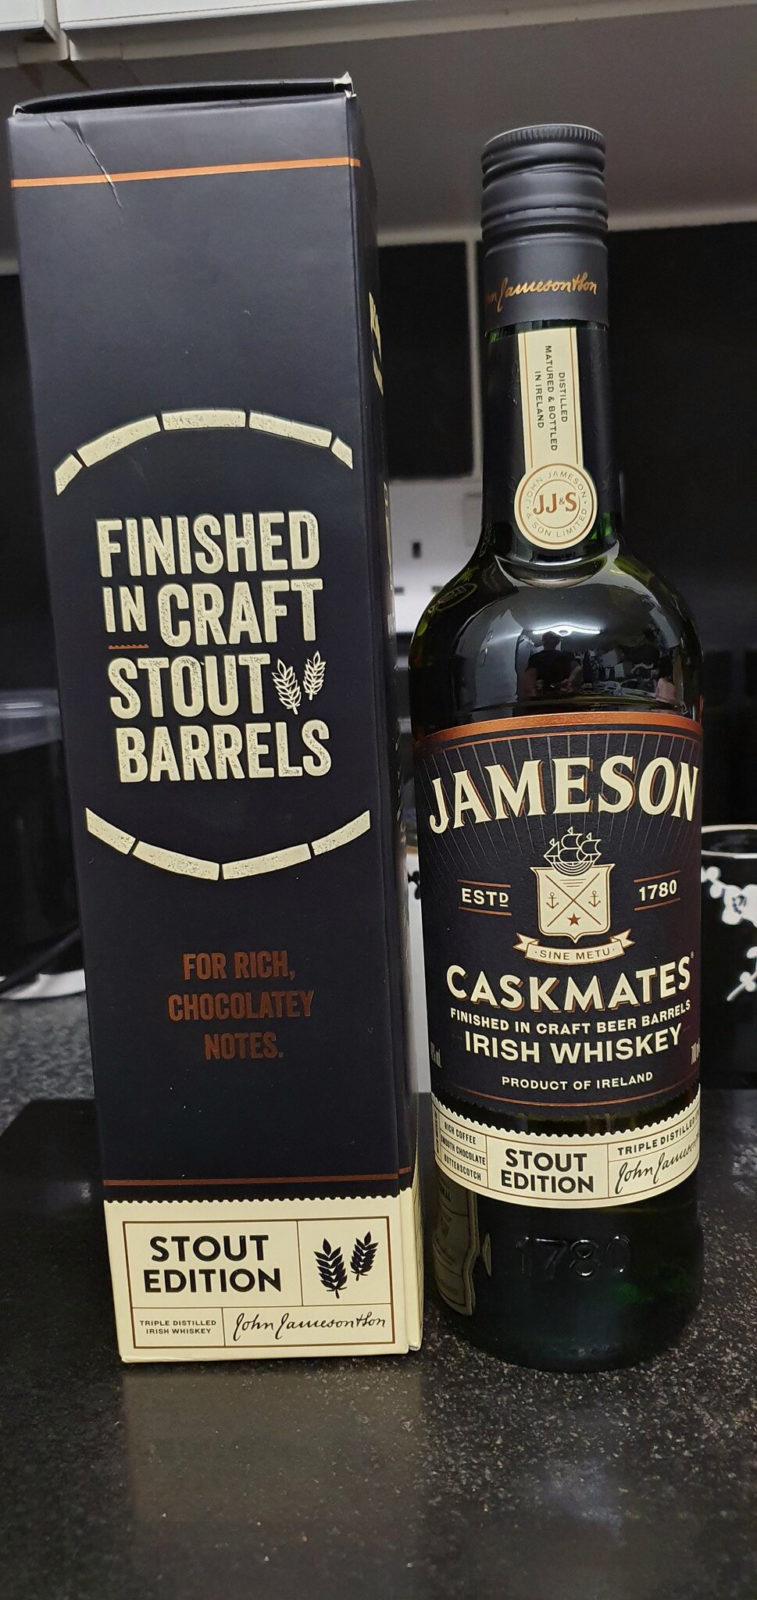 Виски Jameson Caskmates Stout Edition